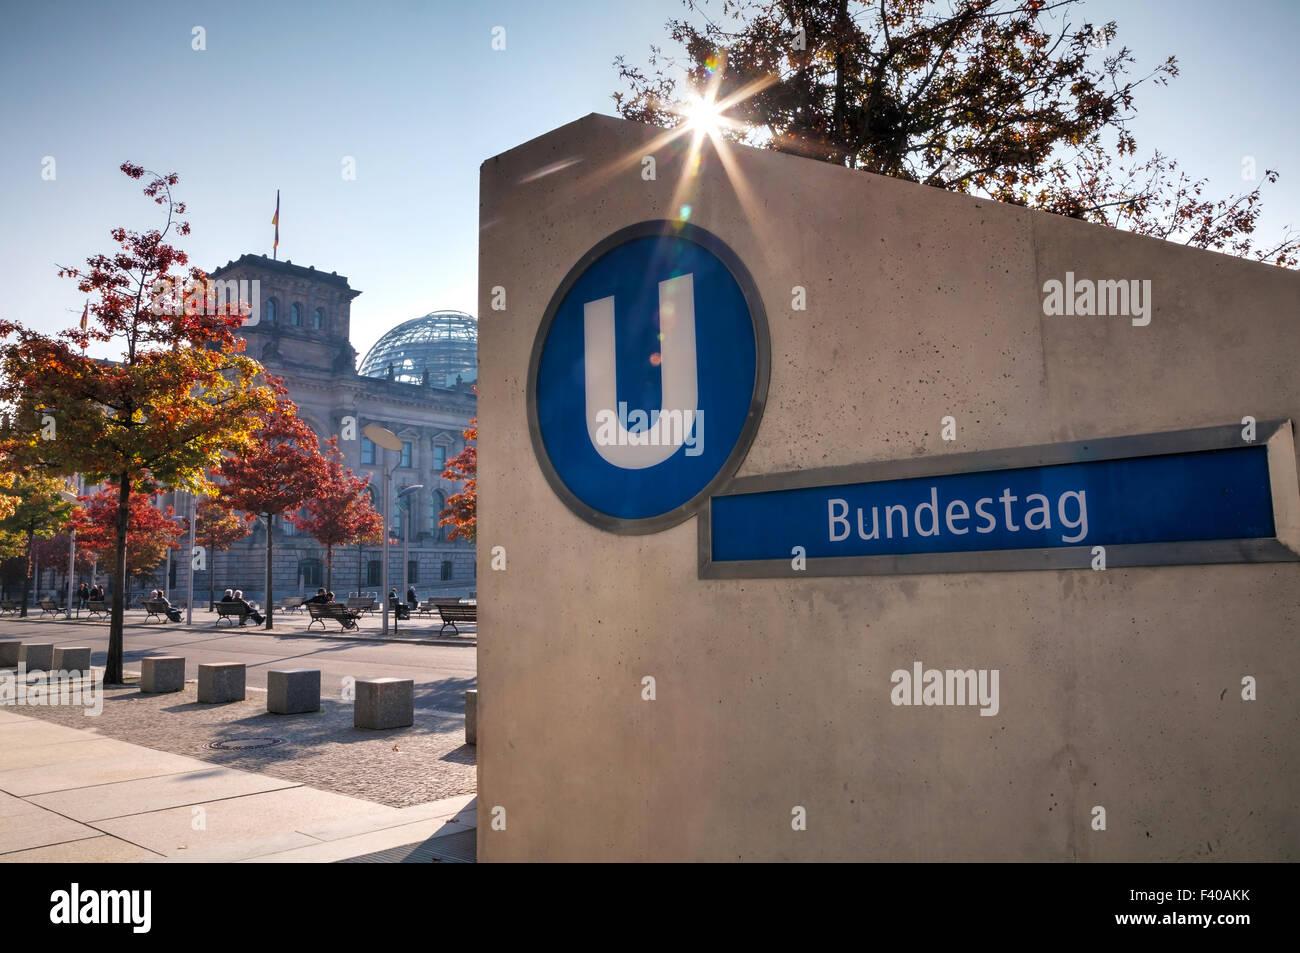 Bundestag underground sign in Berlin - Stock Image